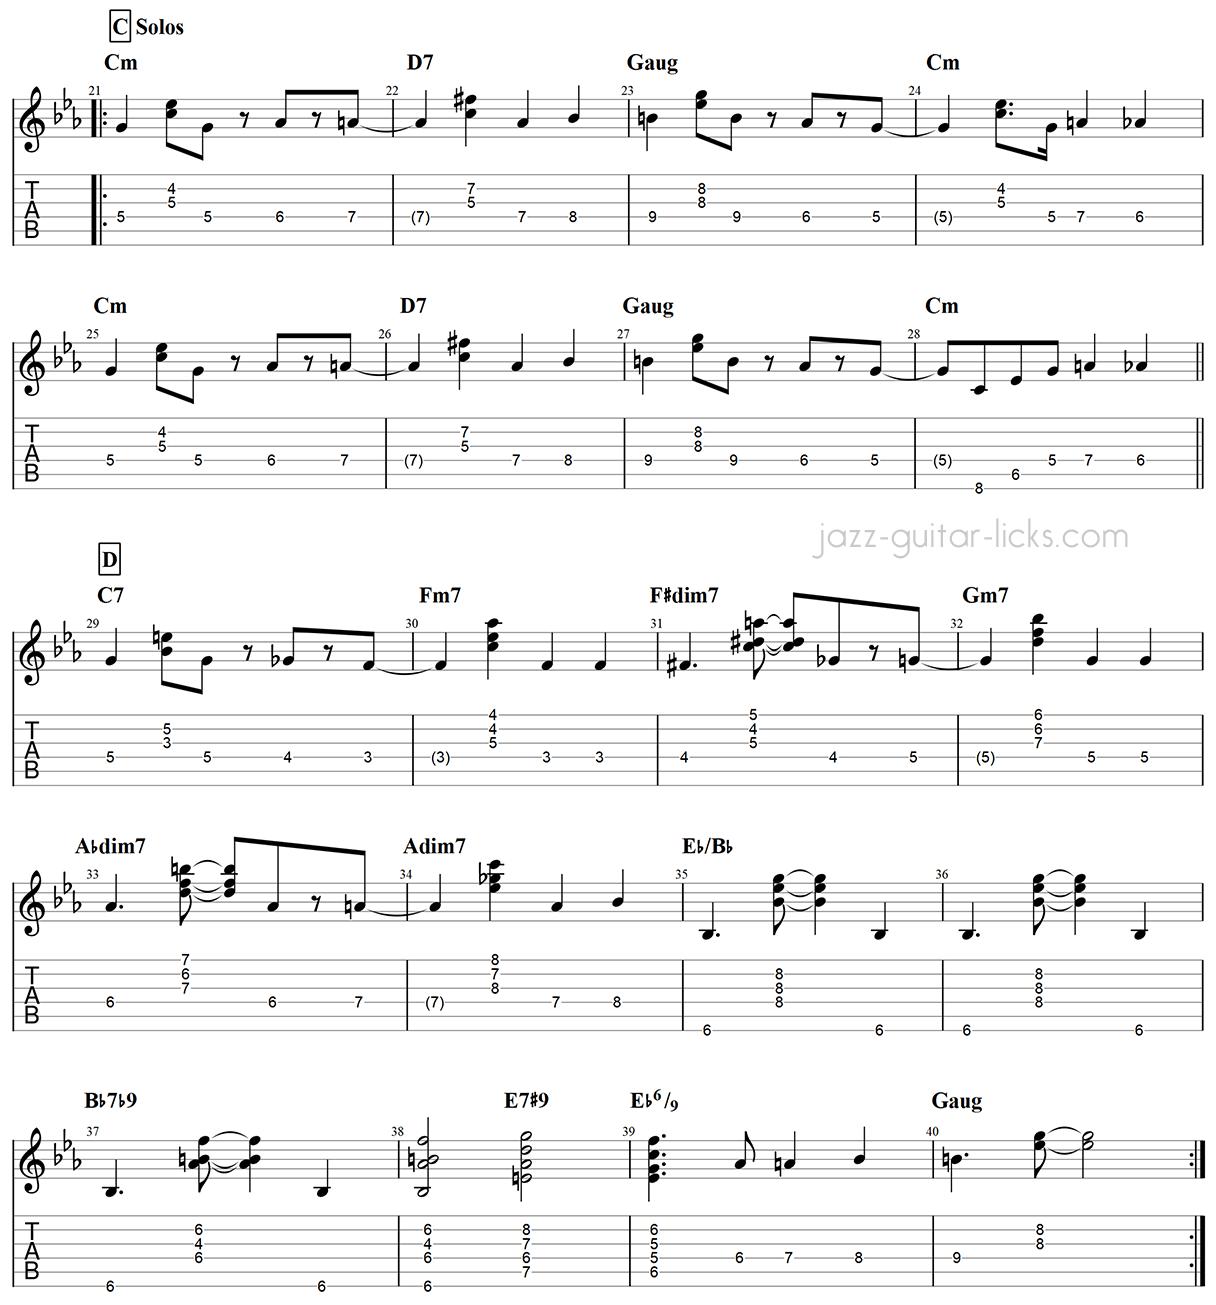 Armando s rumba guitar chords chick corea part 3